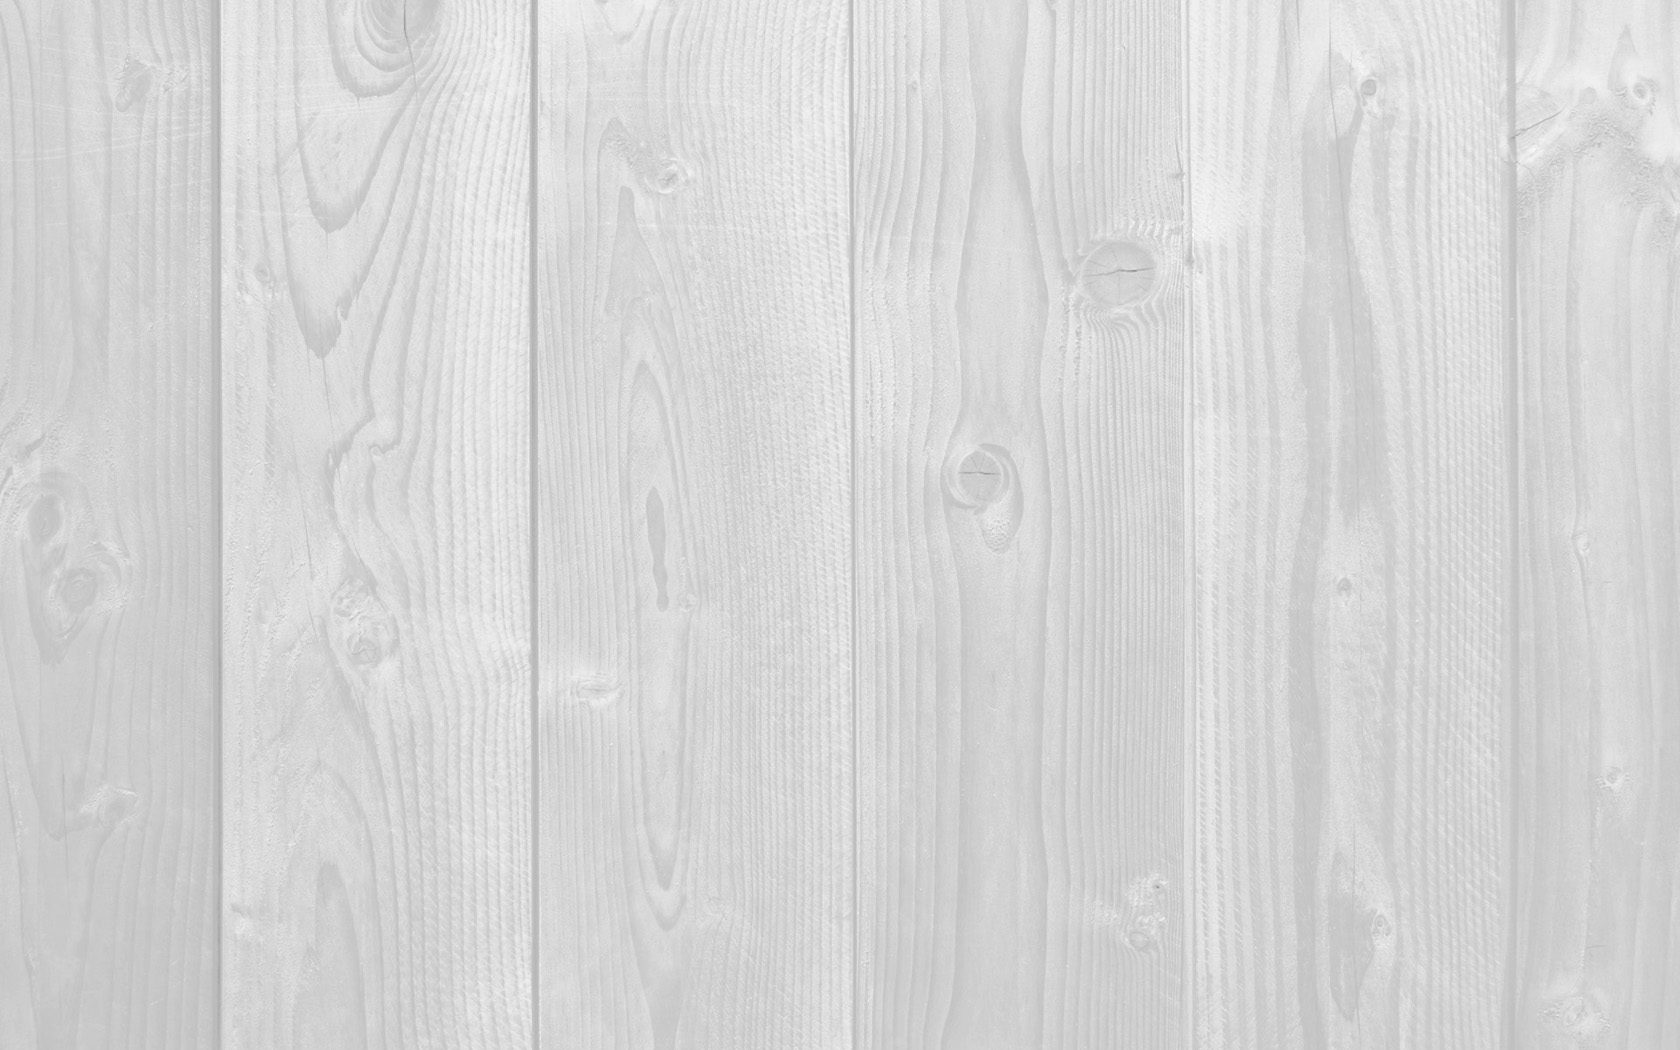 White Wash Wood Wallpaper Wallpapersafari Whitewash Background White Wood Background Large L E24714f9061ddbfe Axis Interiors Llc